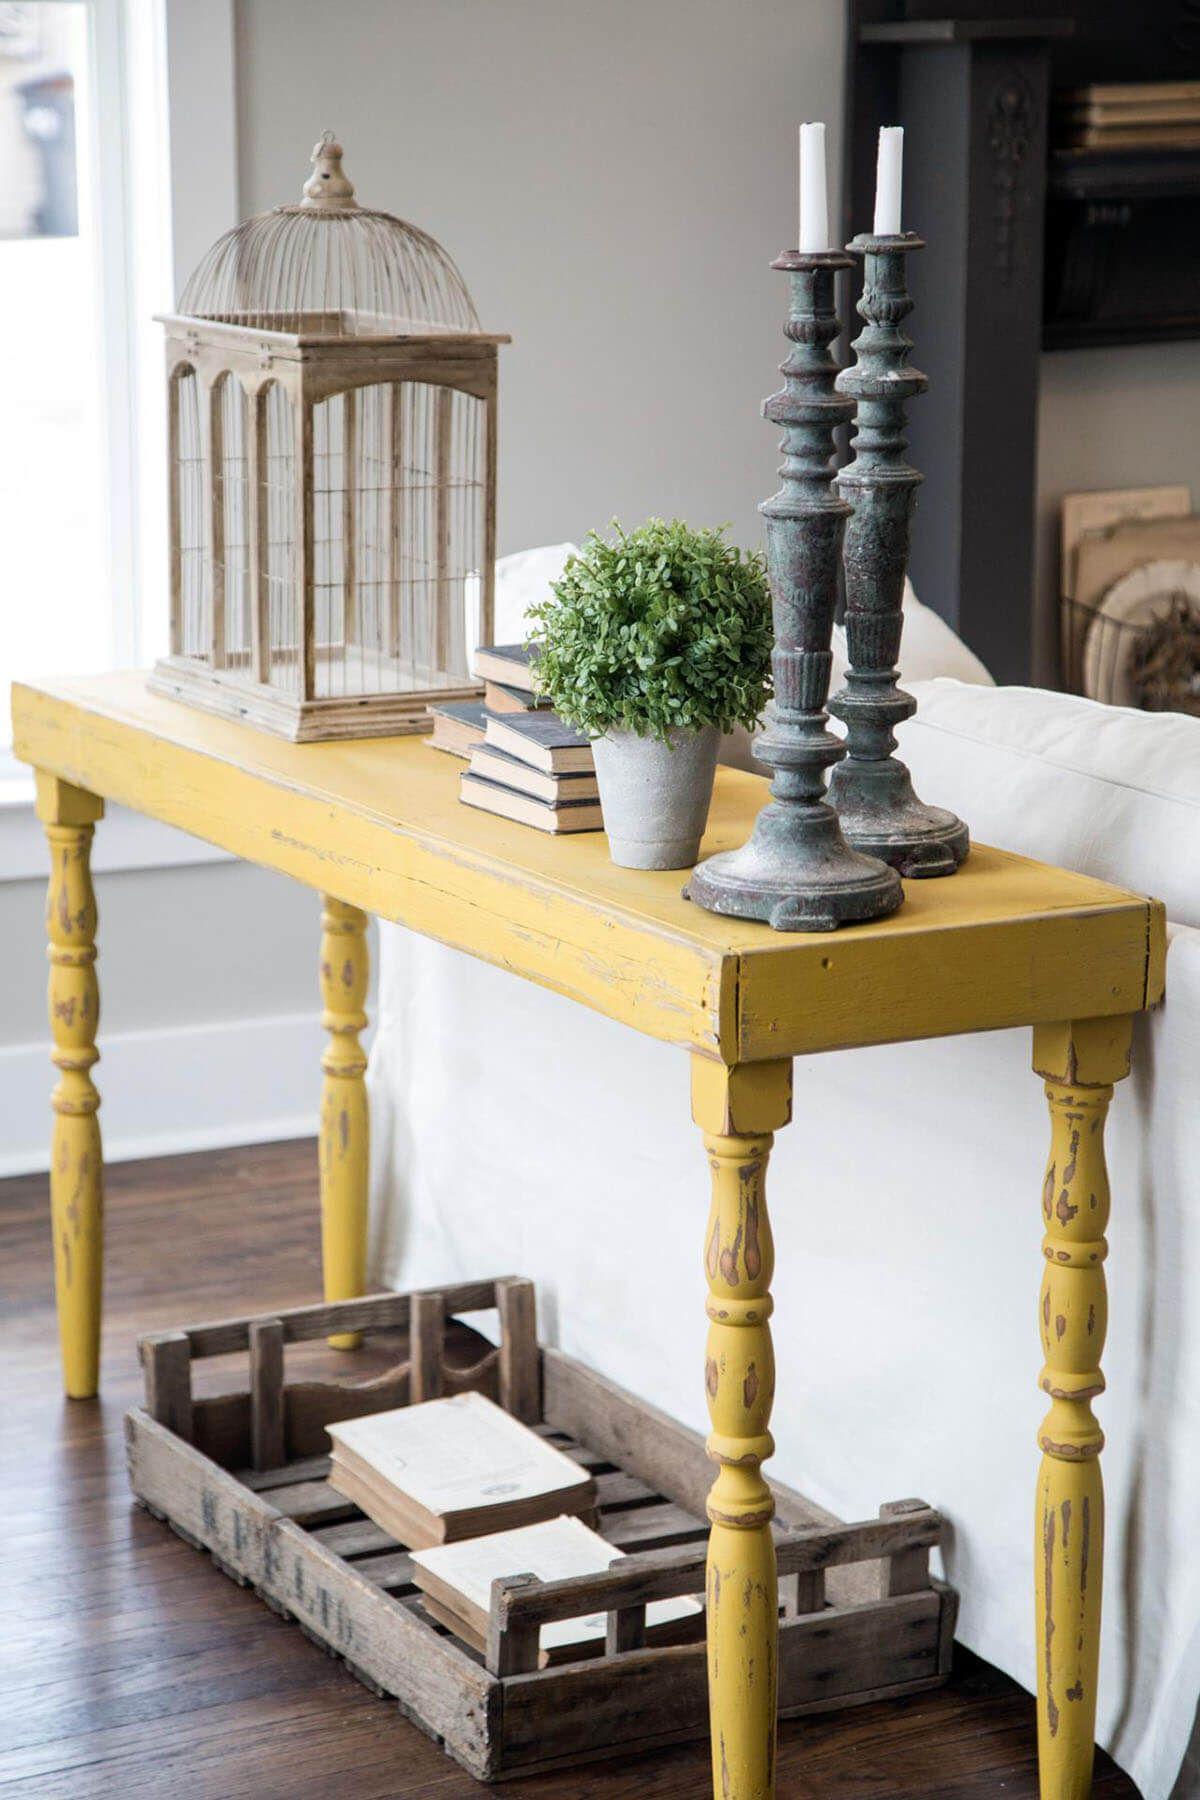 Joanna gaines hallway ideas   Trendige Sofa Tisch Ideen dekofeiernubtrendigesofa